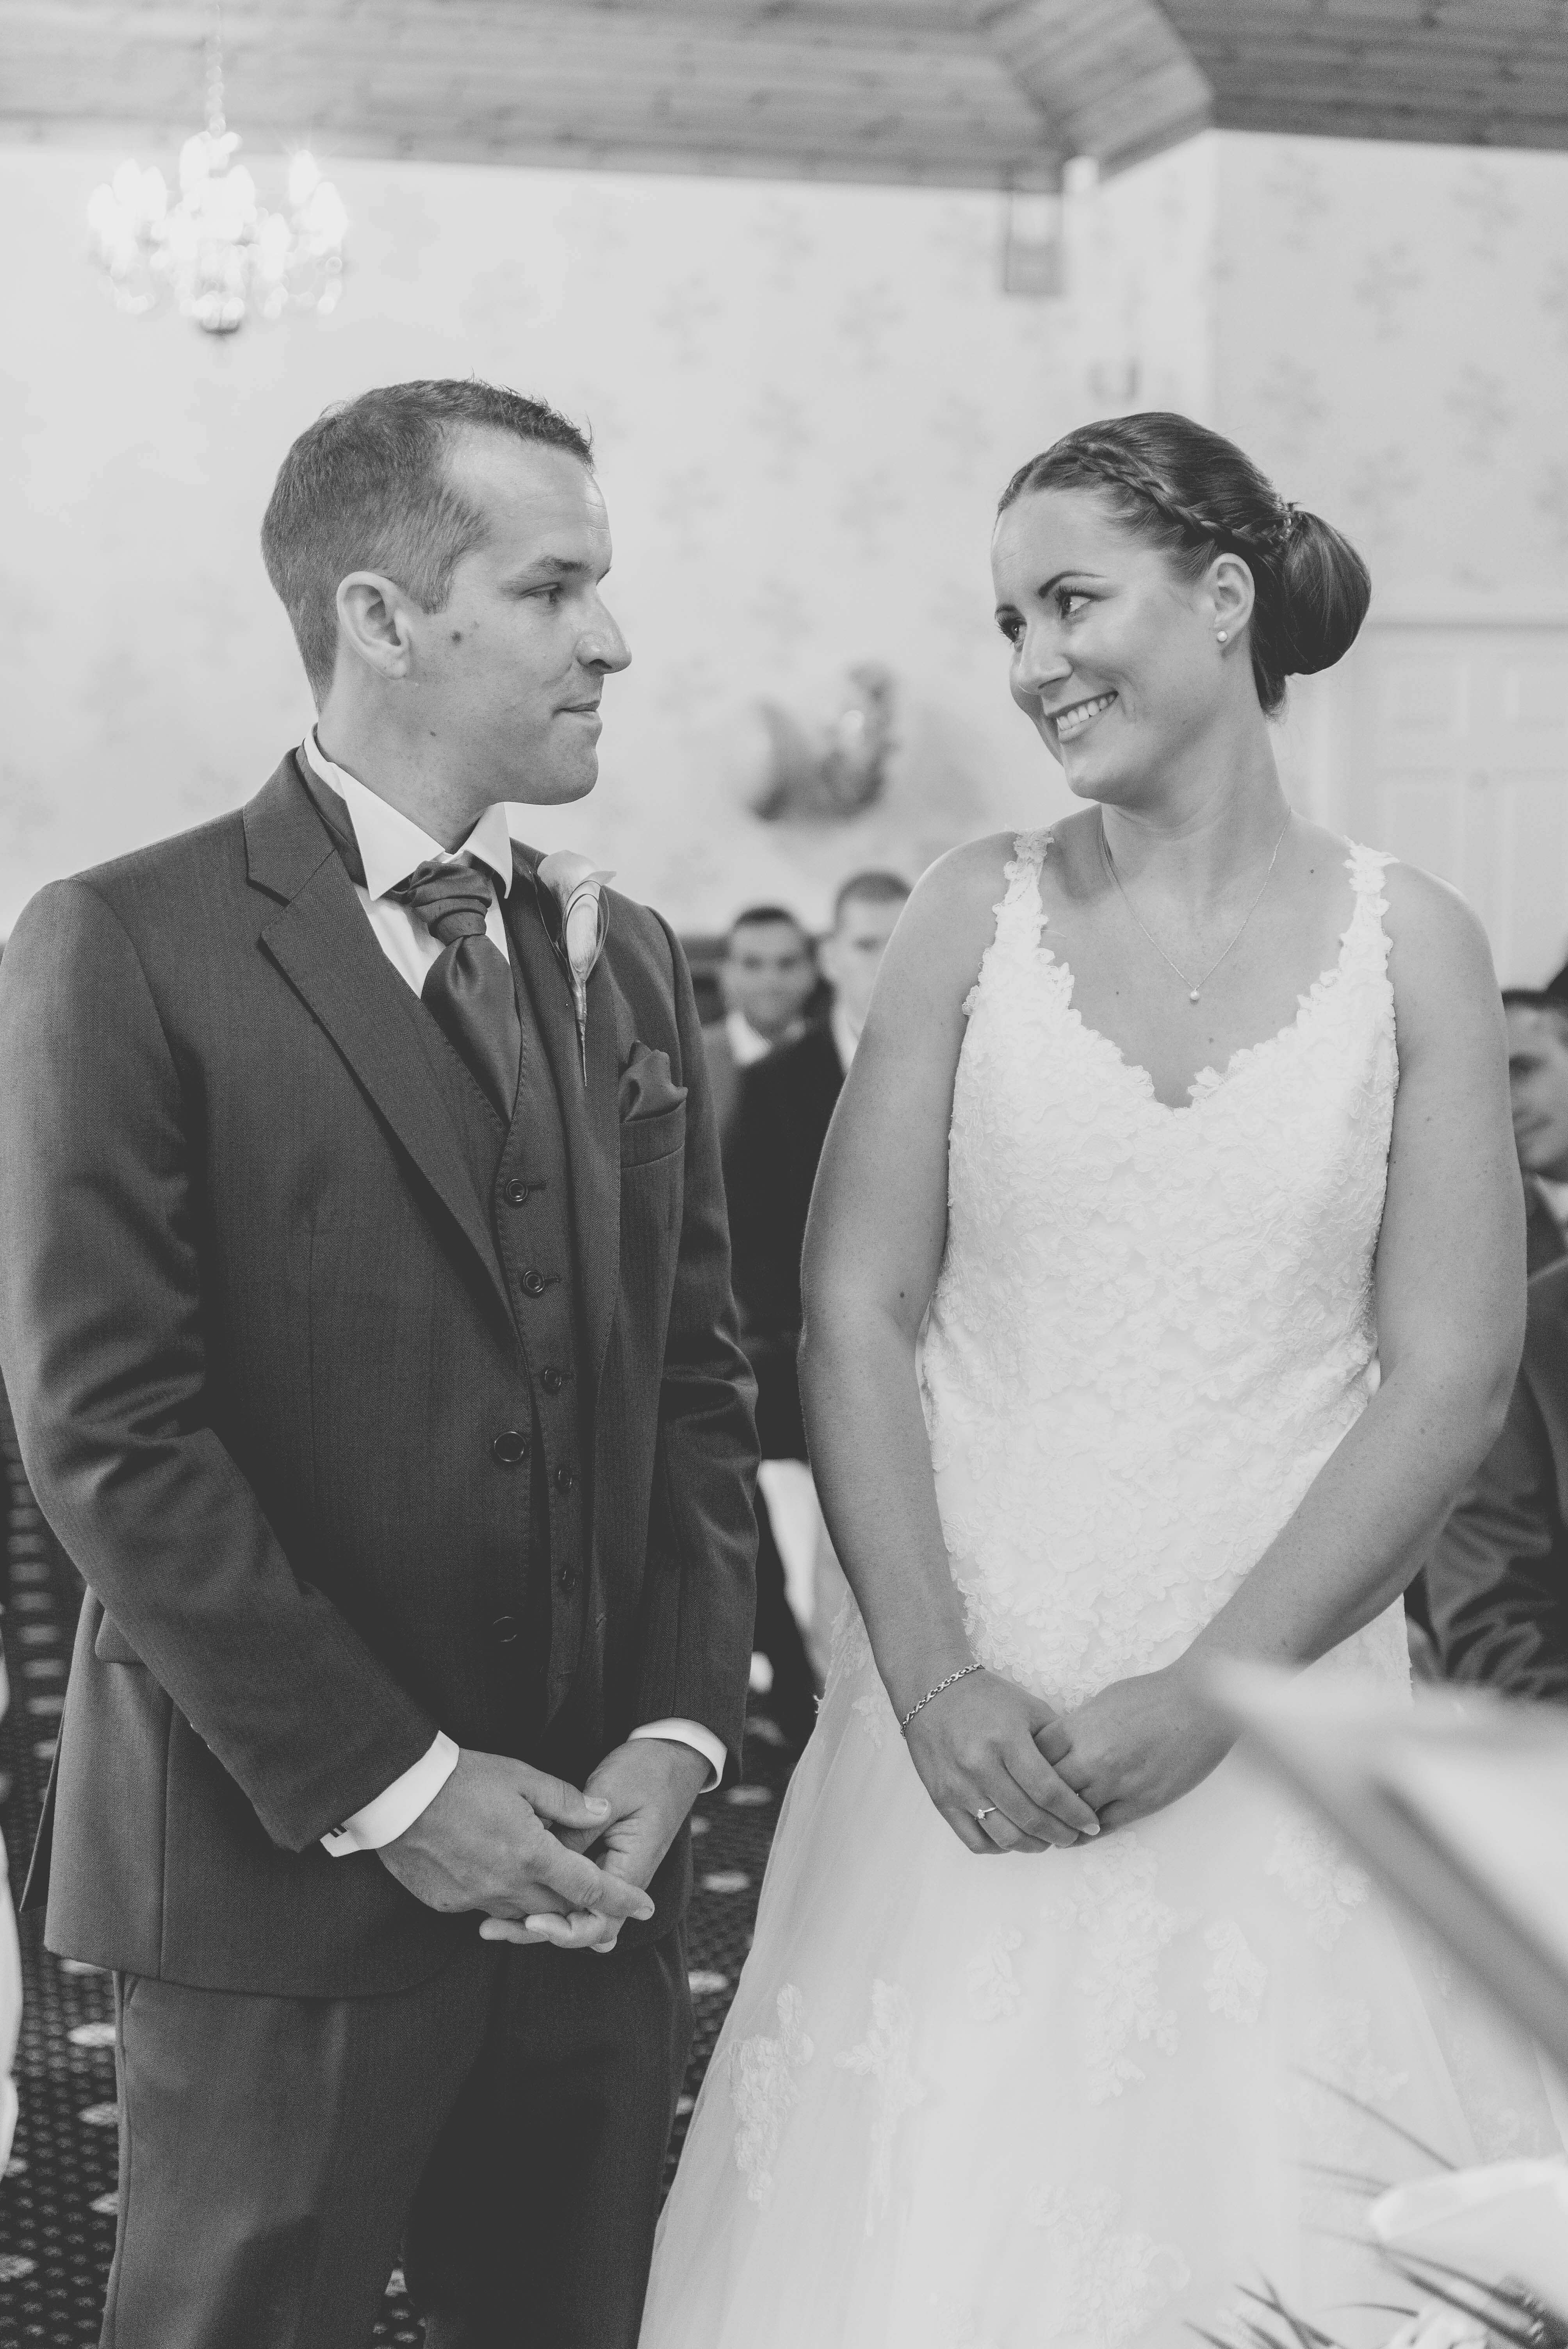 Barnsdale Hall Rutland Wedding 13 10 2016 13